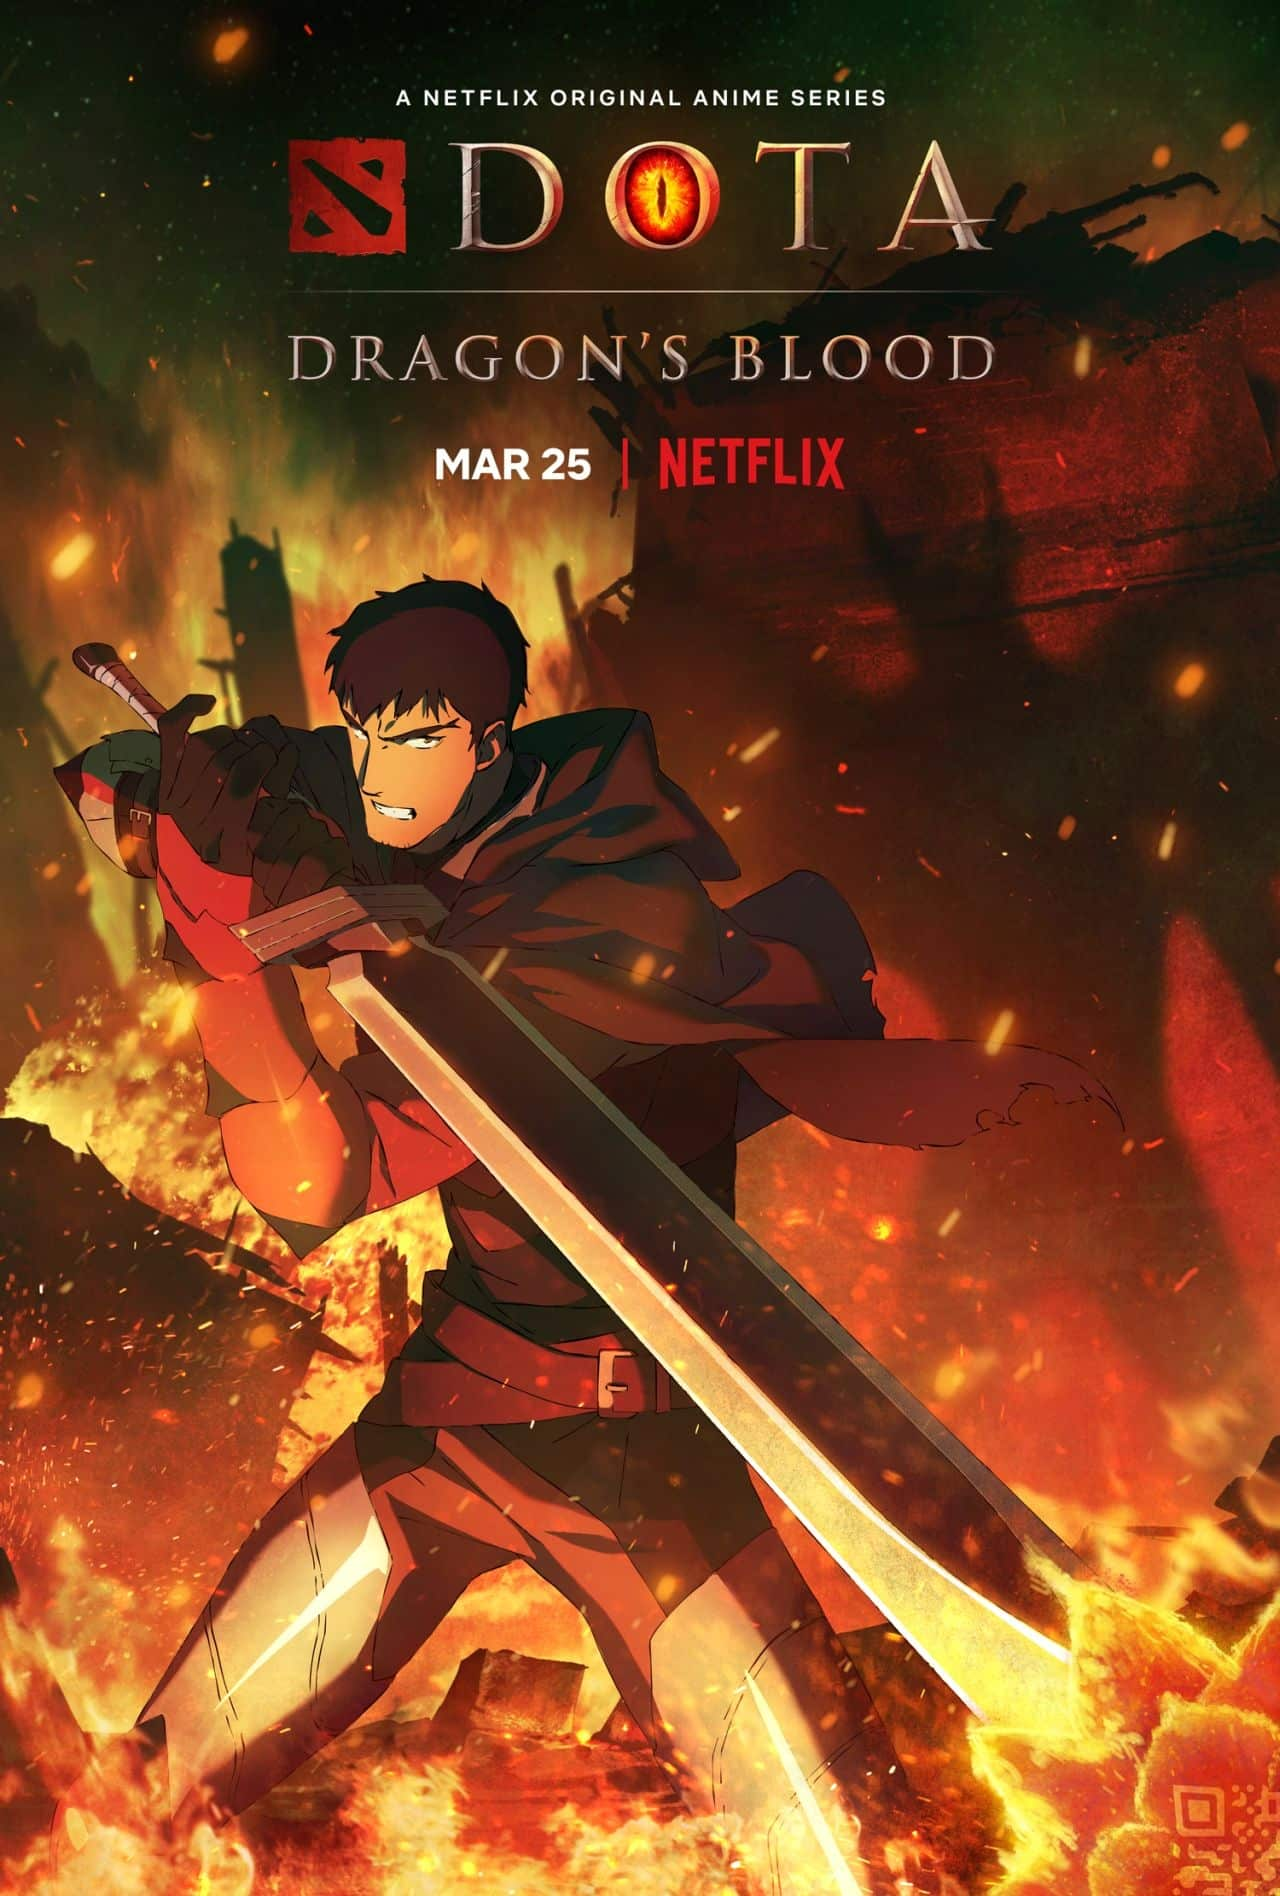 DOTA: Dragon's Blood trailer poster